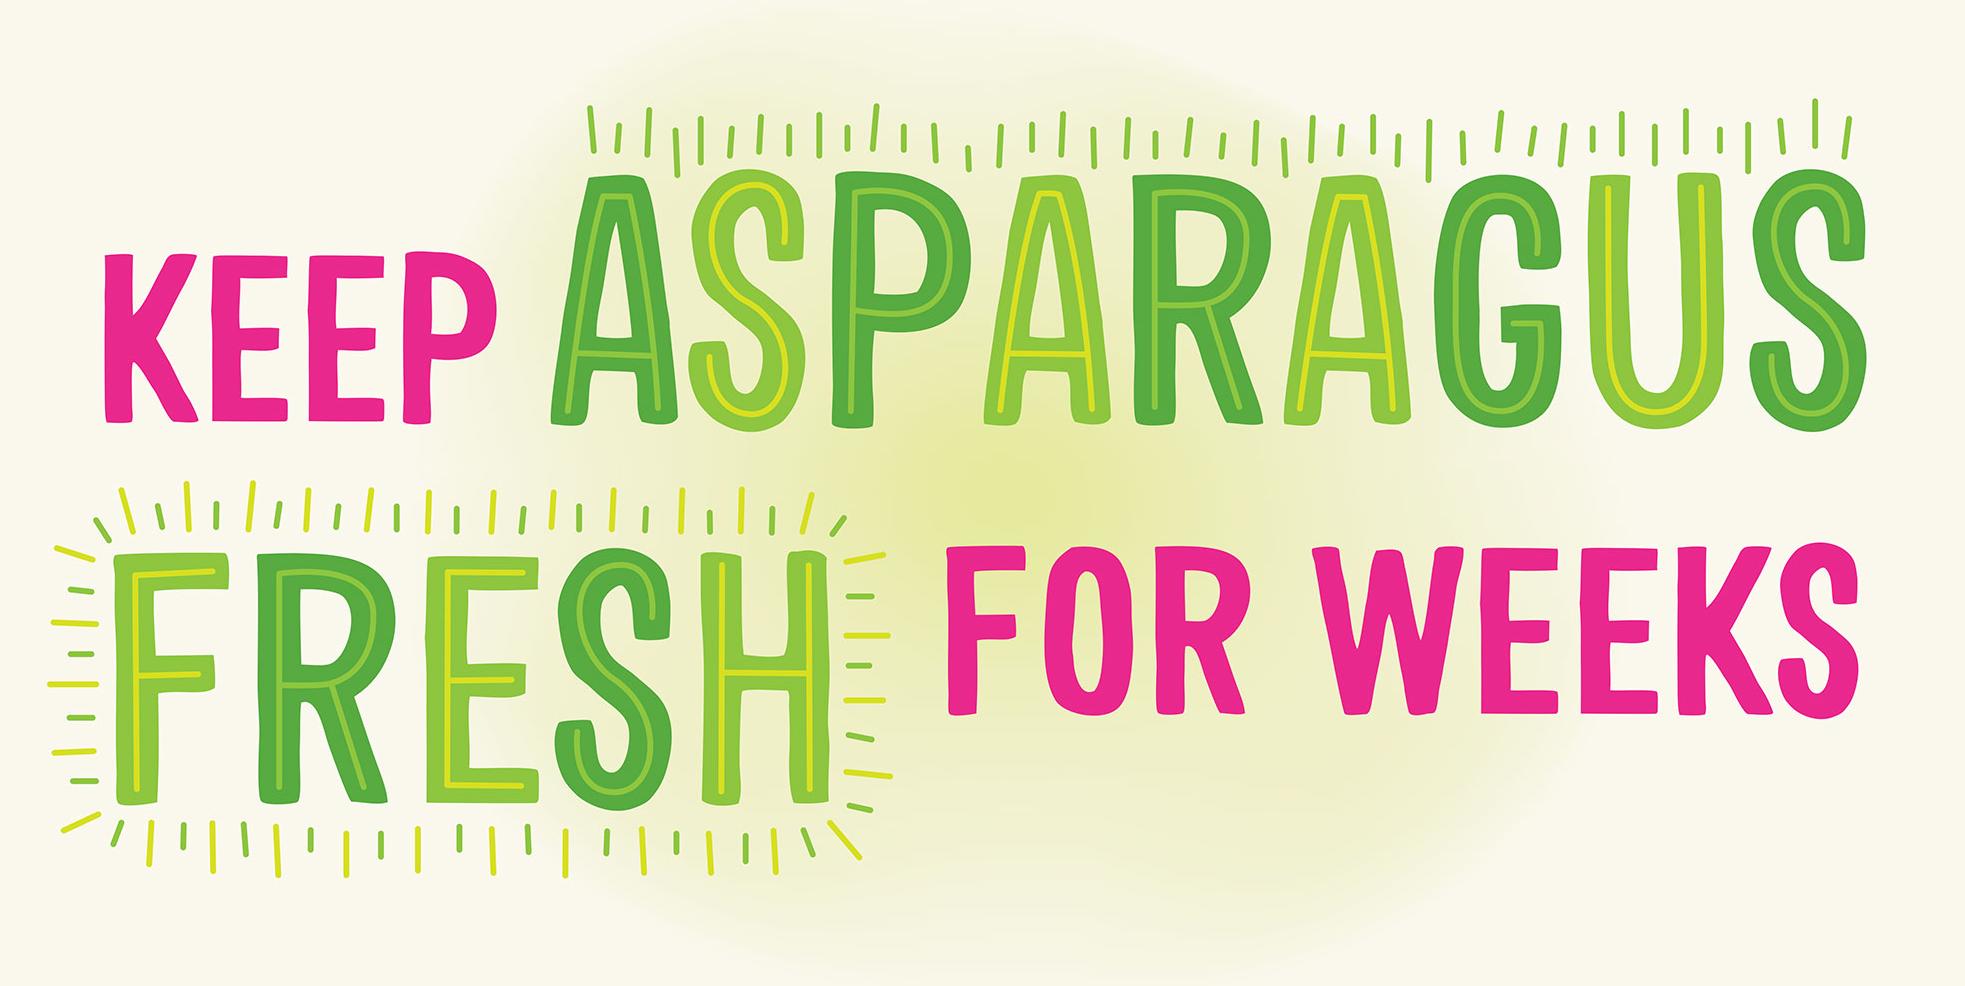 Keep Asparagus Fresh for Weeks